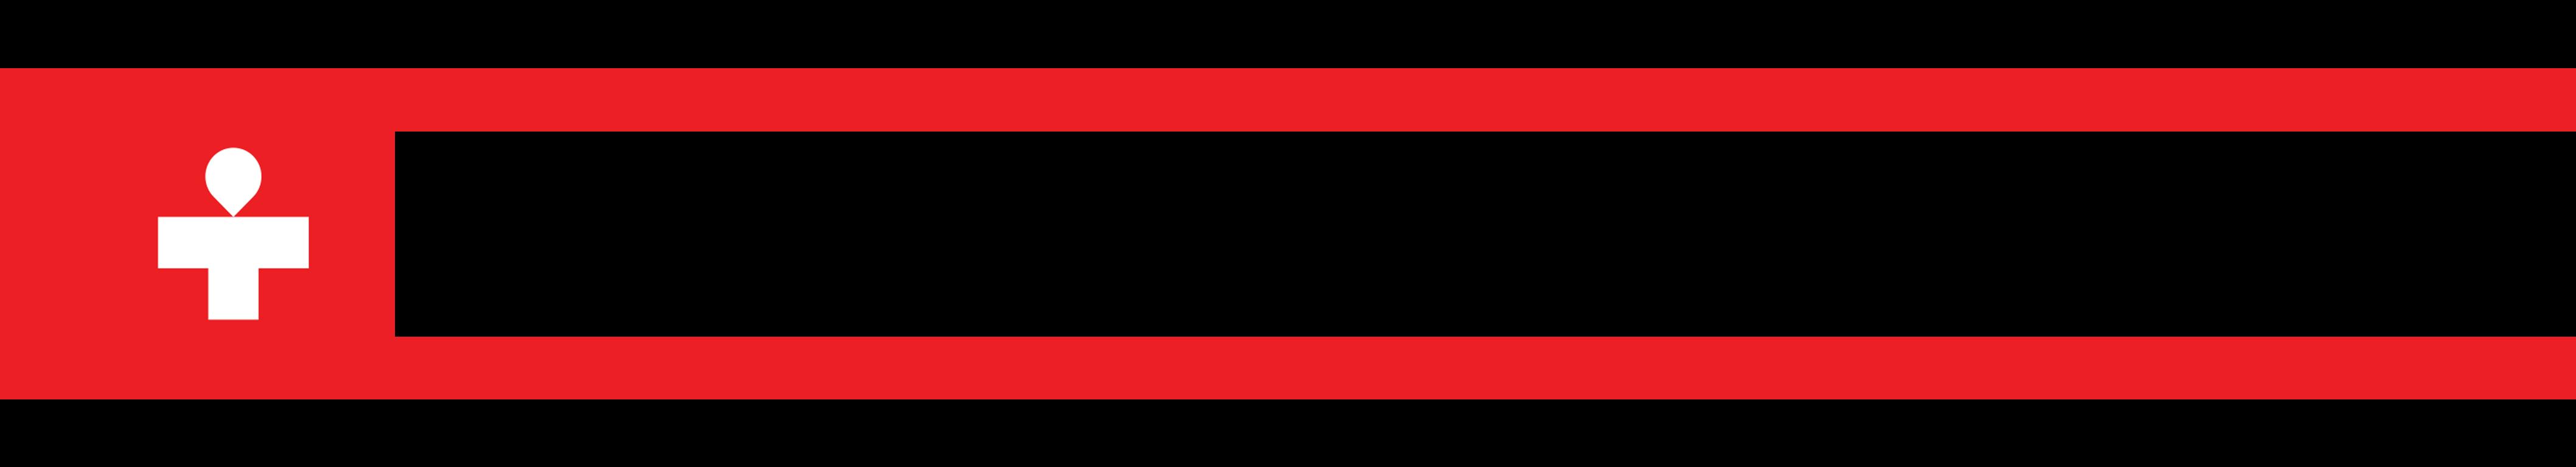 Clinica stomatologica SwissDental exclusiv Buzau – clinici stomatologice urgente non stop implant dentar stomatolog implante pret implant clinica dentara cabinete stomatologice